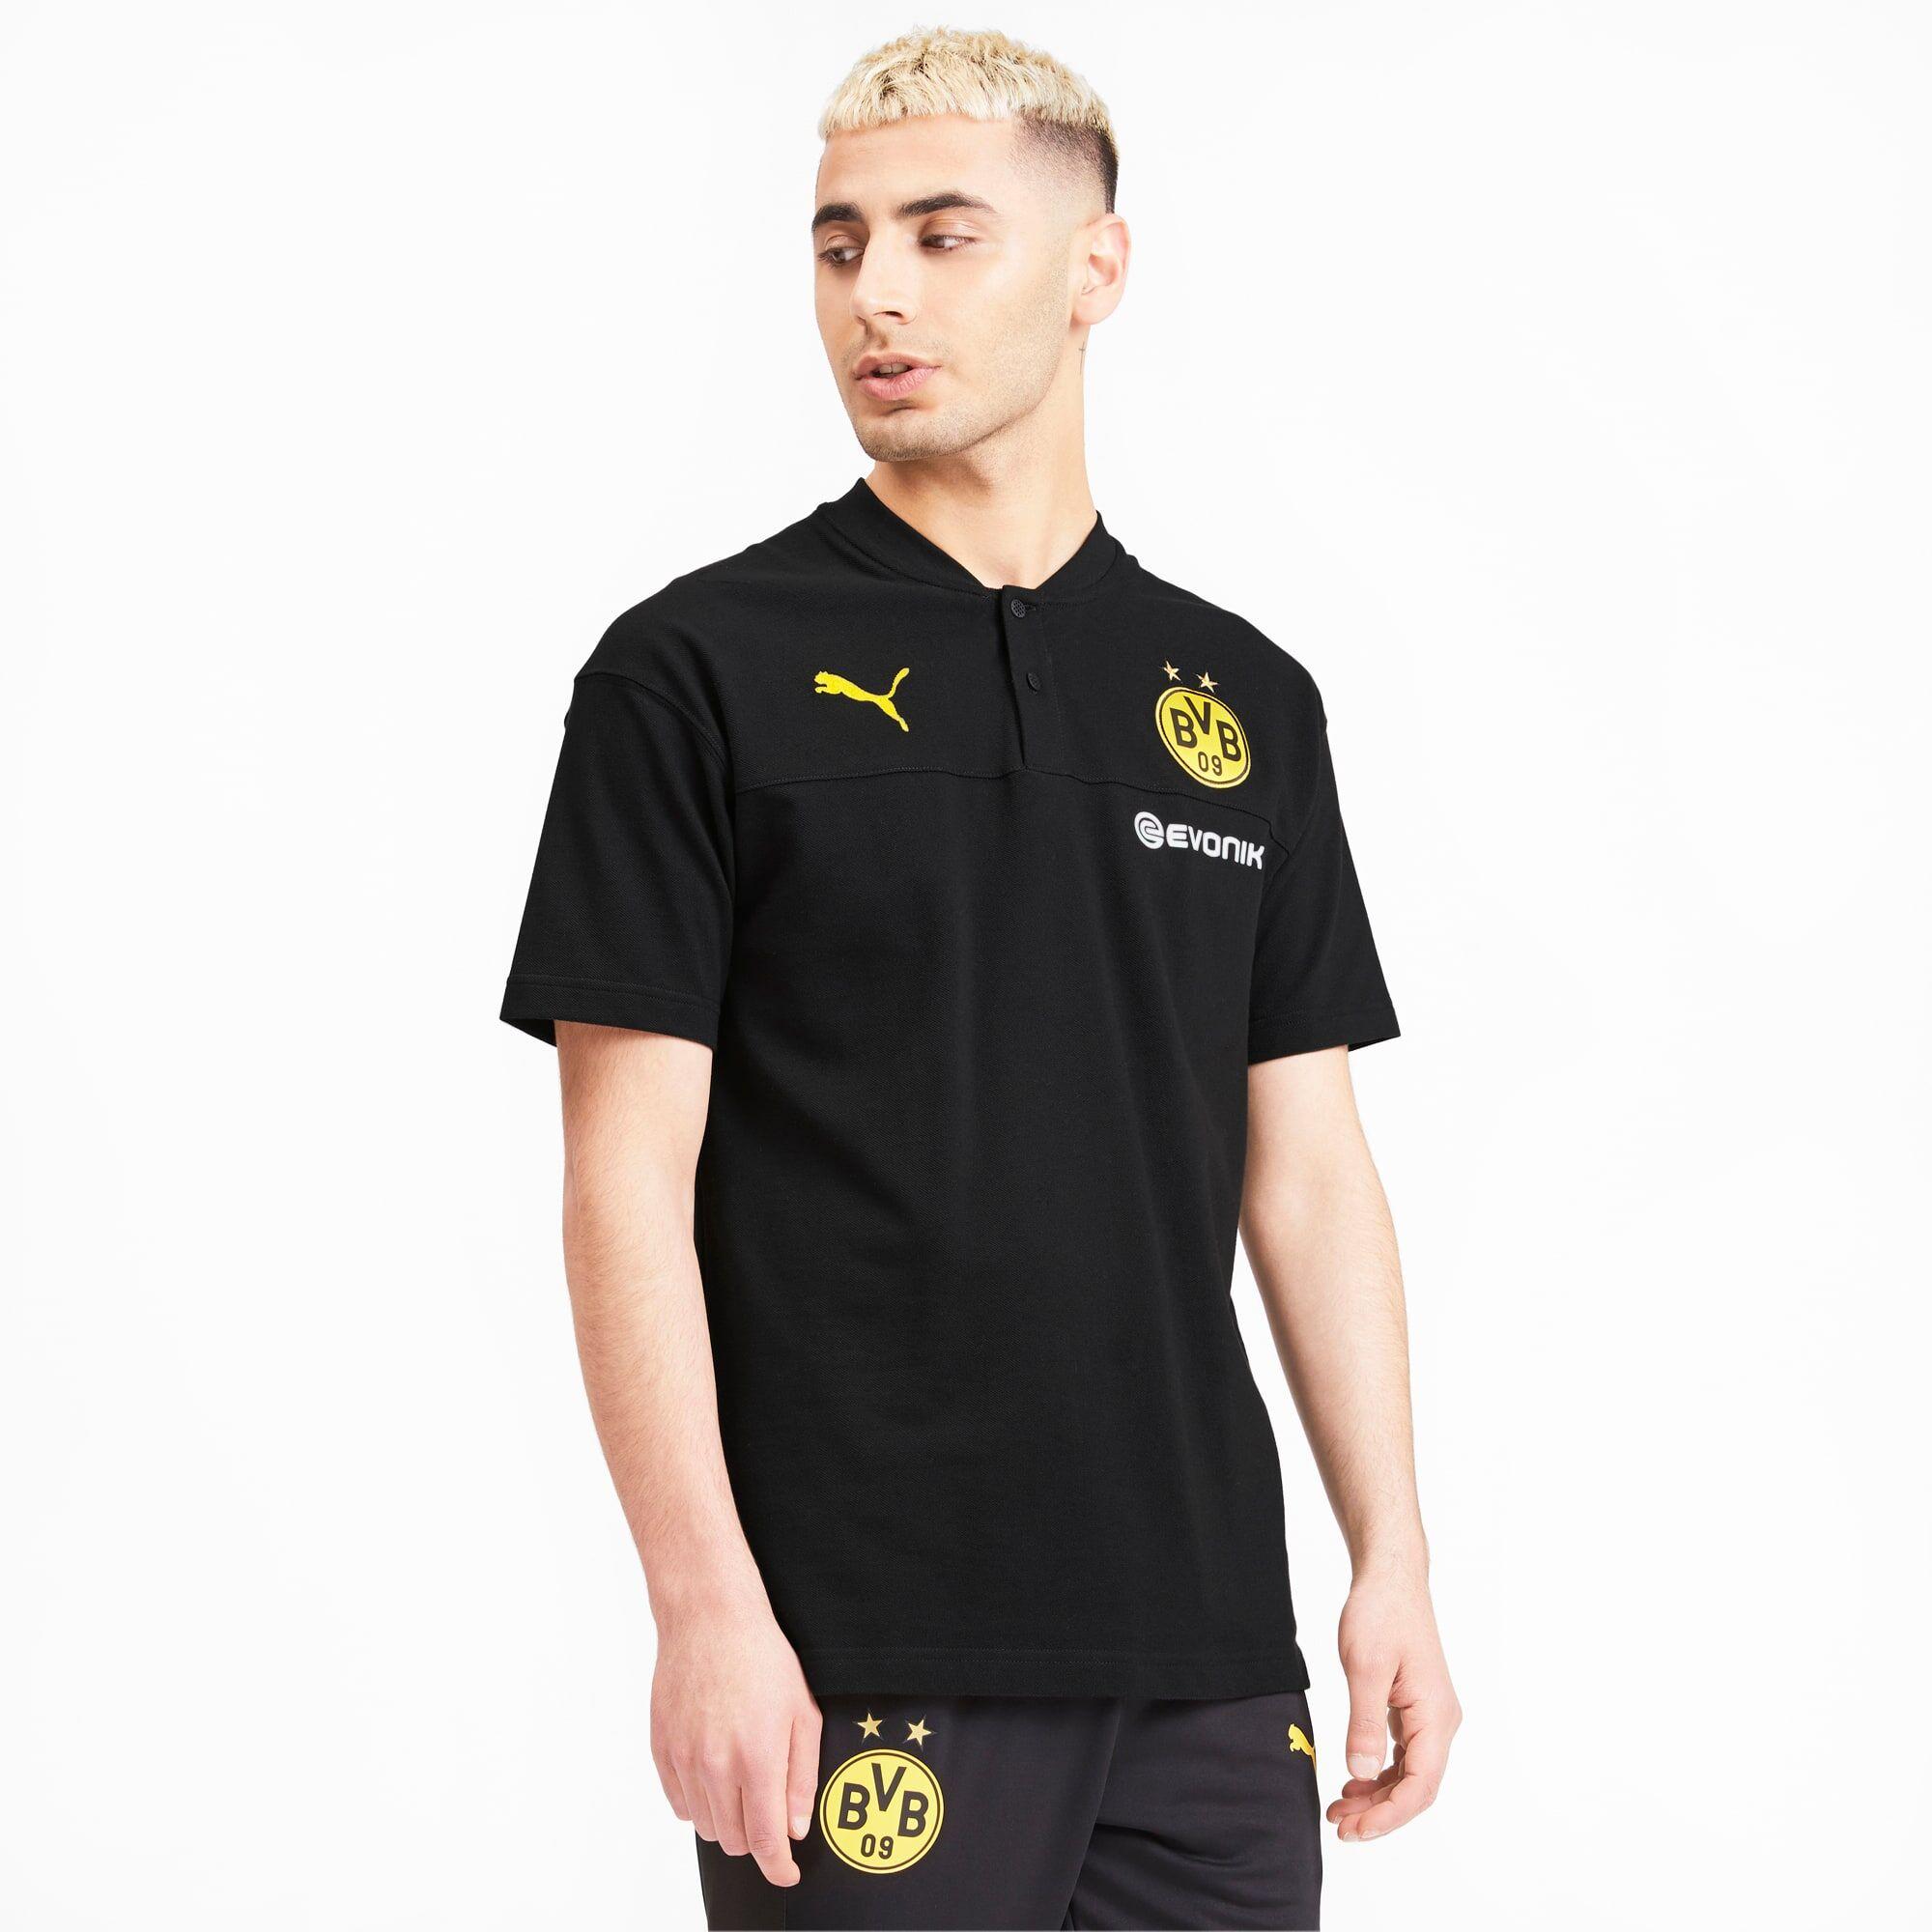 Puma BVB Casuals Men's Polo Shirt,  Black/Phantom Black, size X Small, Clothing